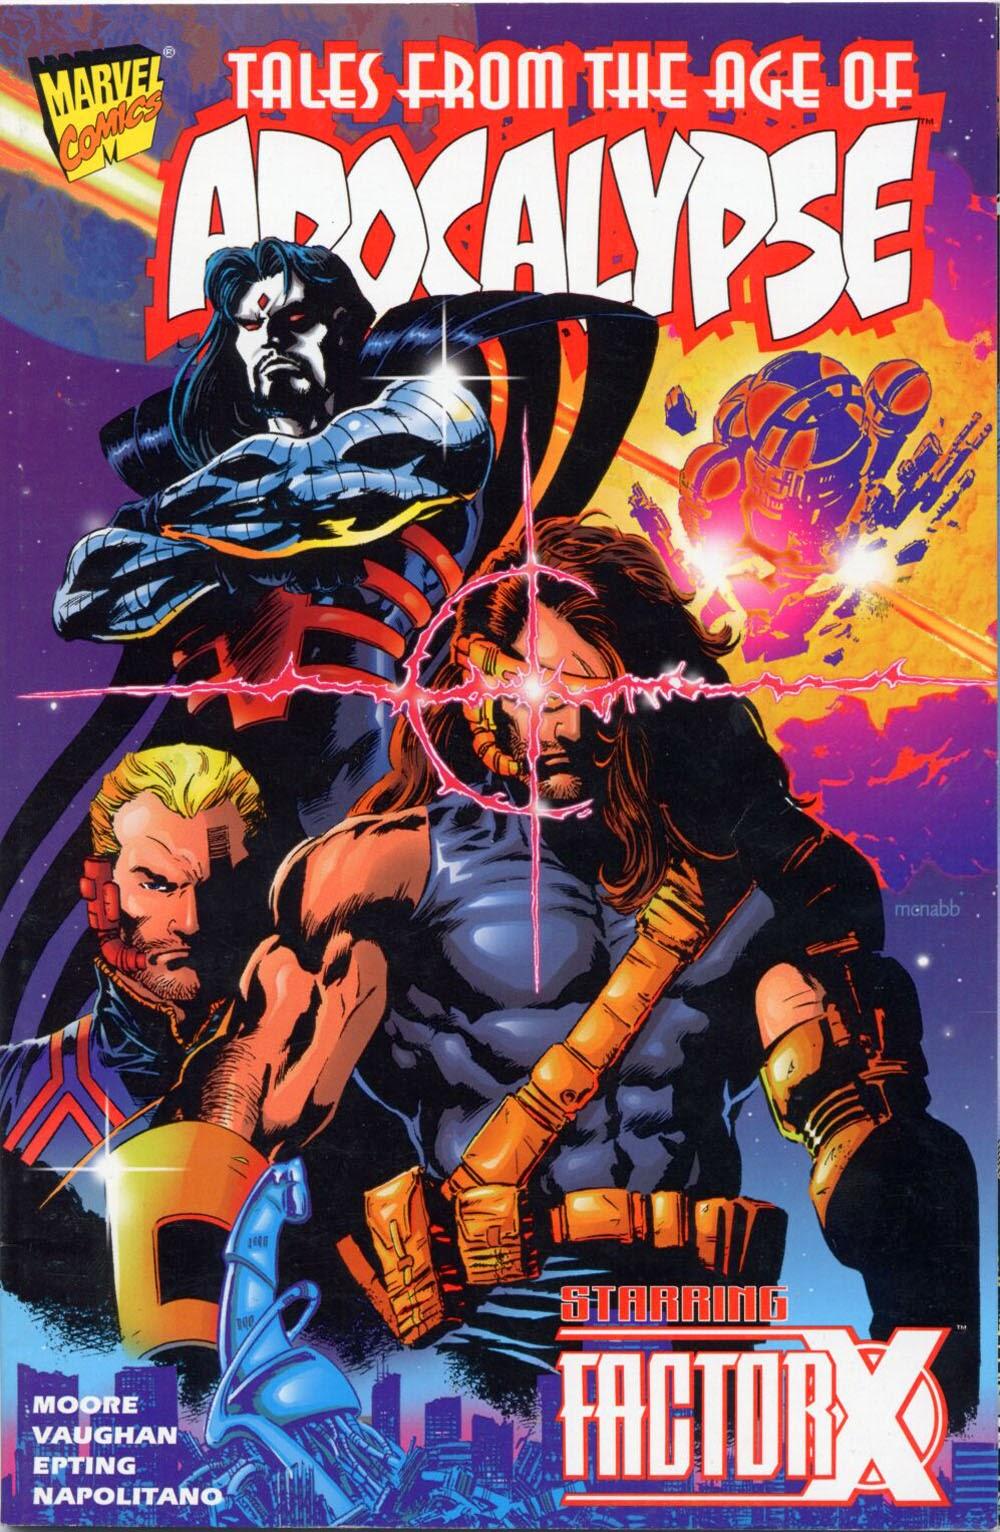 X-Men - A Era do Apocalipse #3